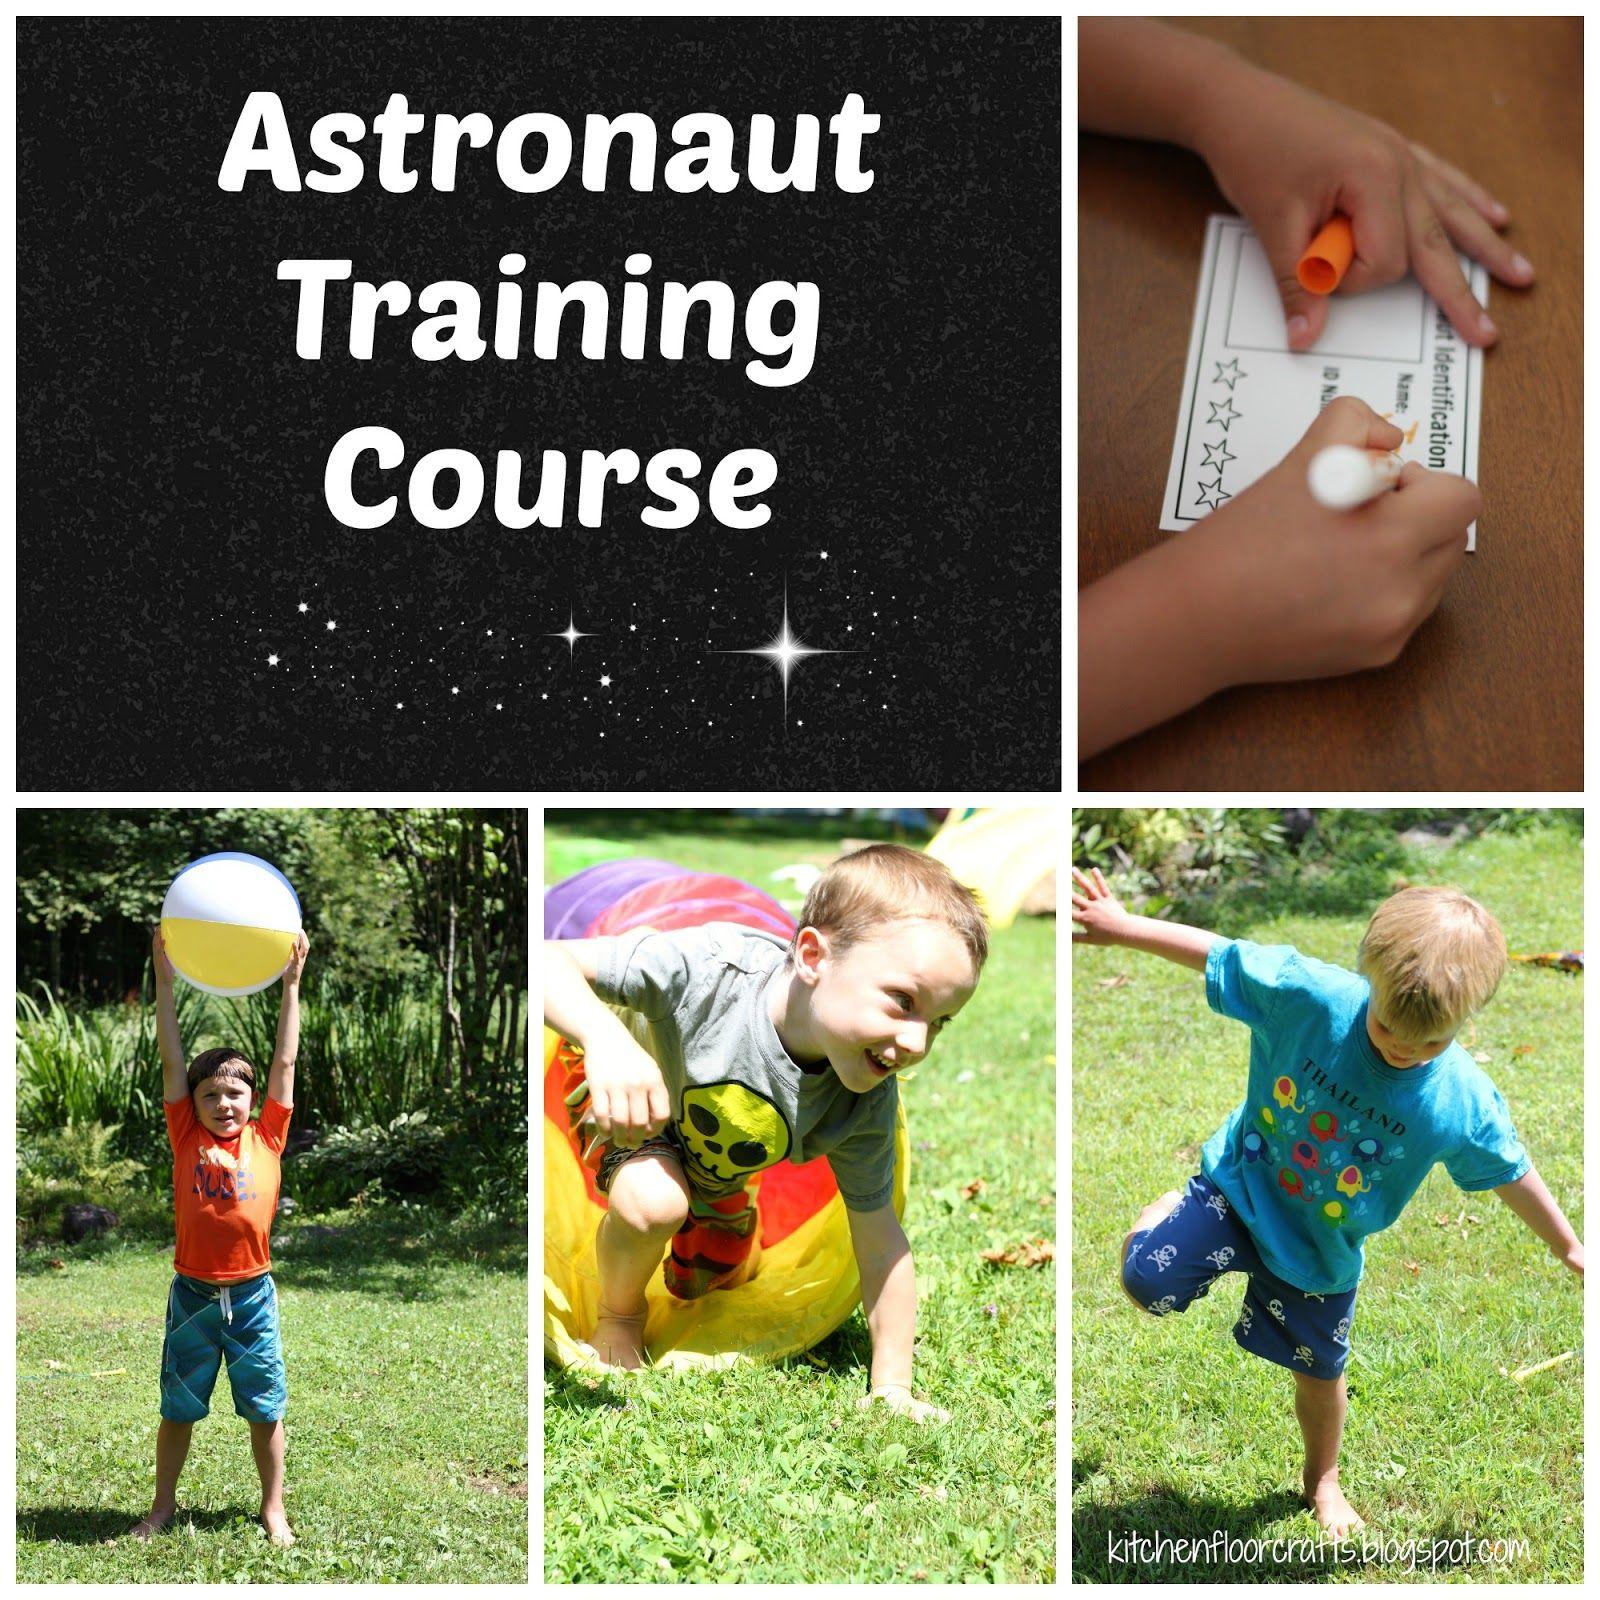 Astronaut Training Course